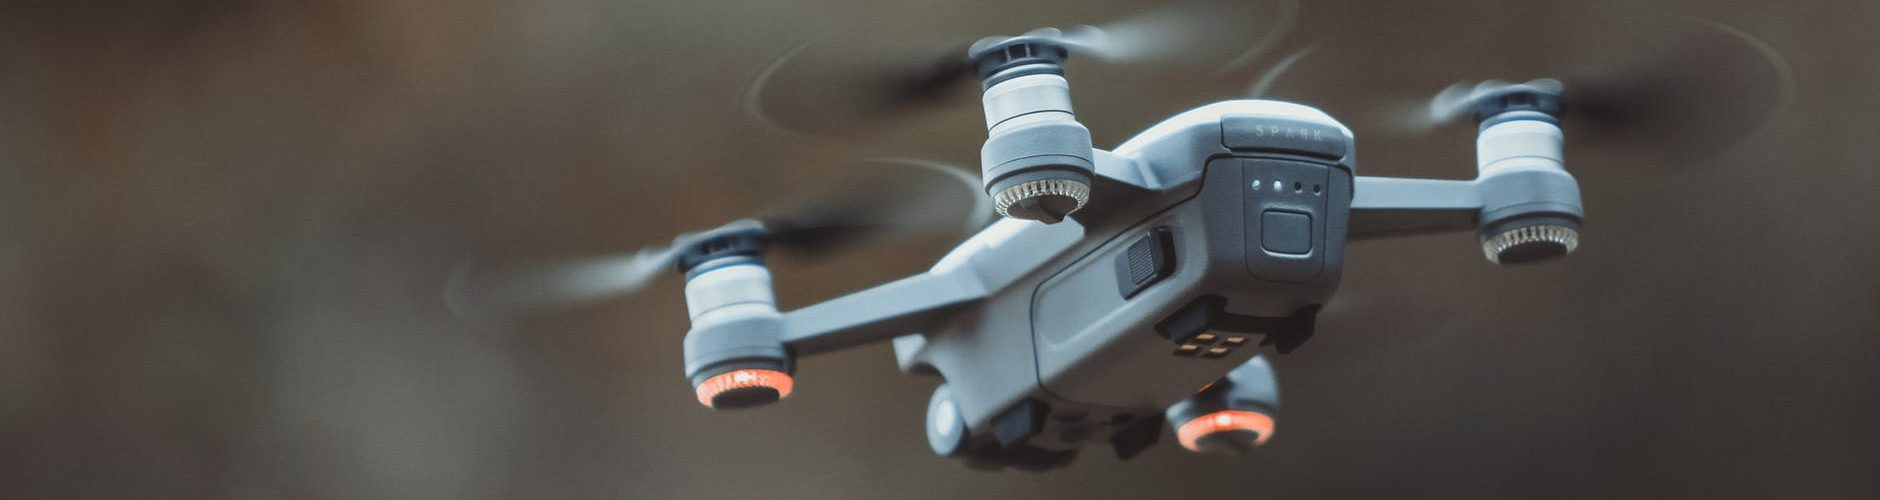 Chinese drone manufacturer considers autonomous cars